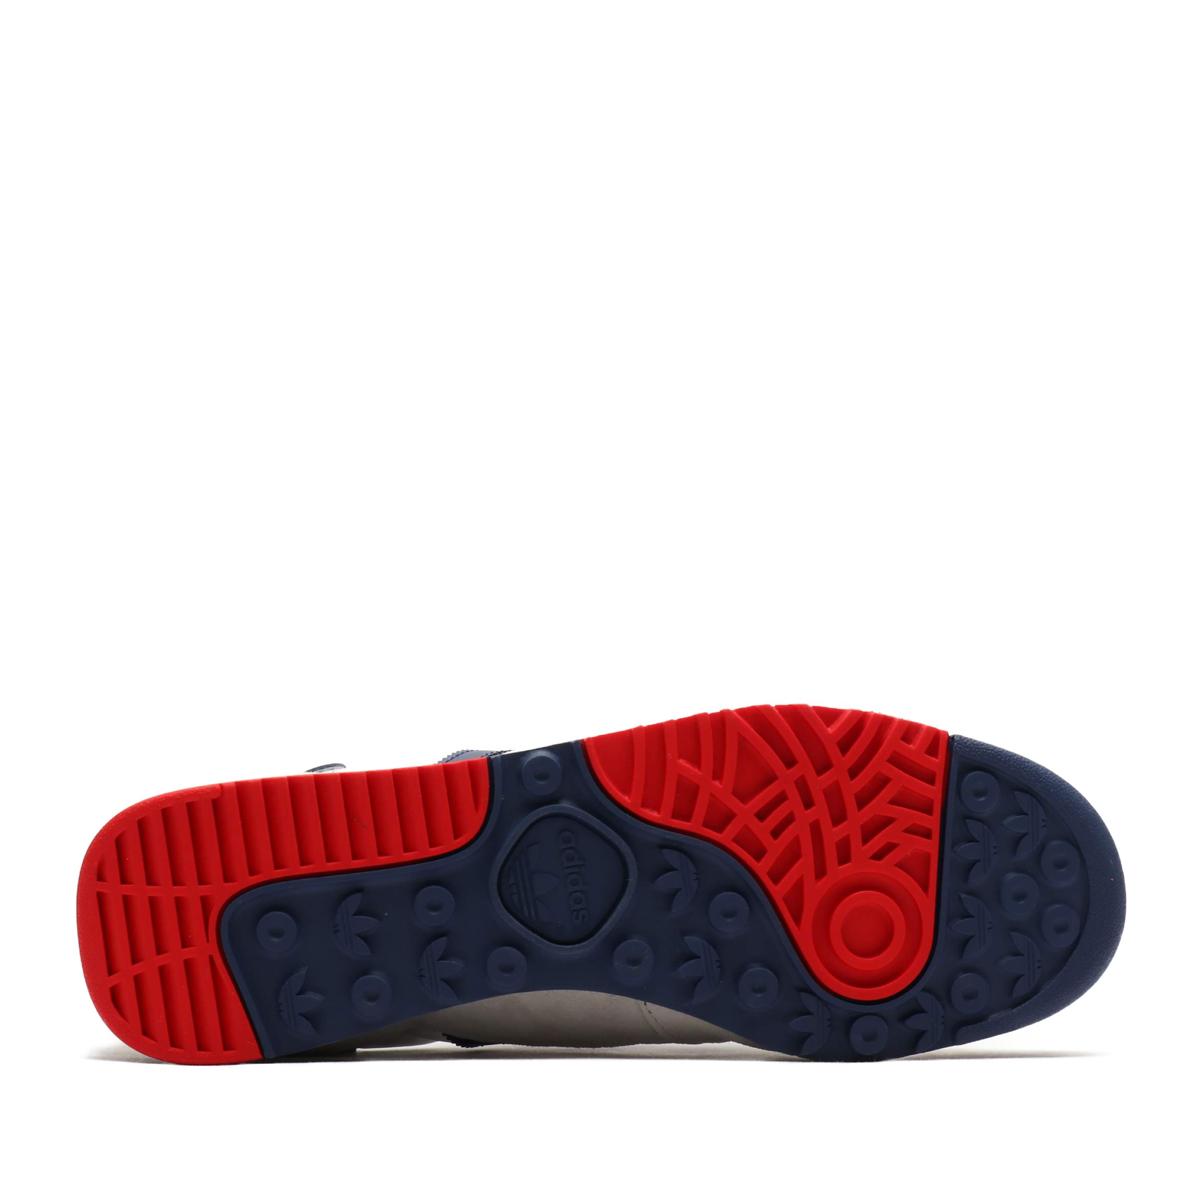 Kinetics: adidas ULTRABOOST 20 (SOLAR REDSOLAR RED